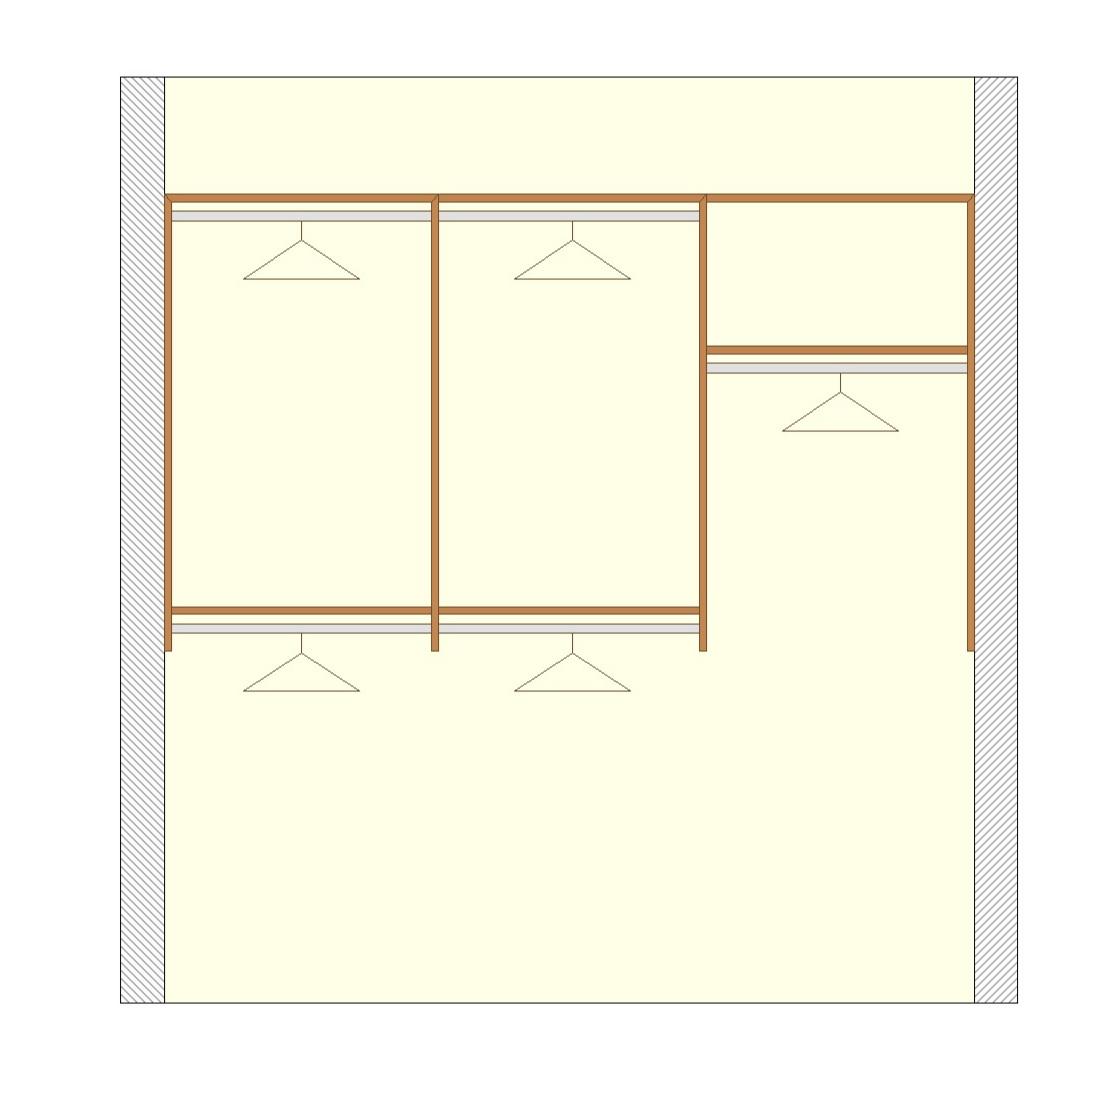 Short & Long Hanging Options - Basic Walk-In